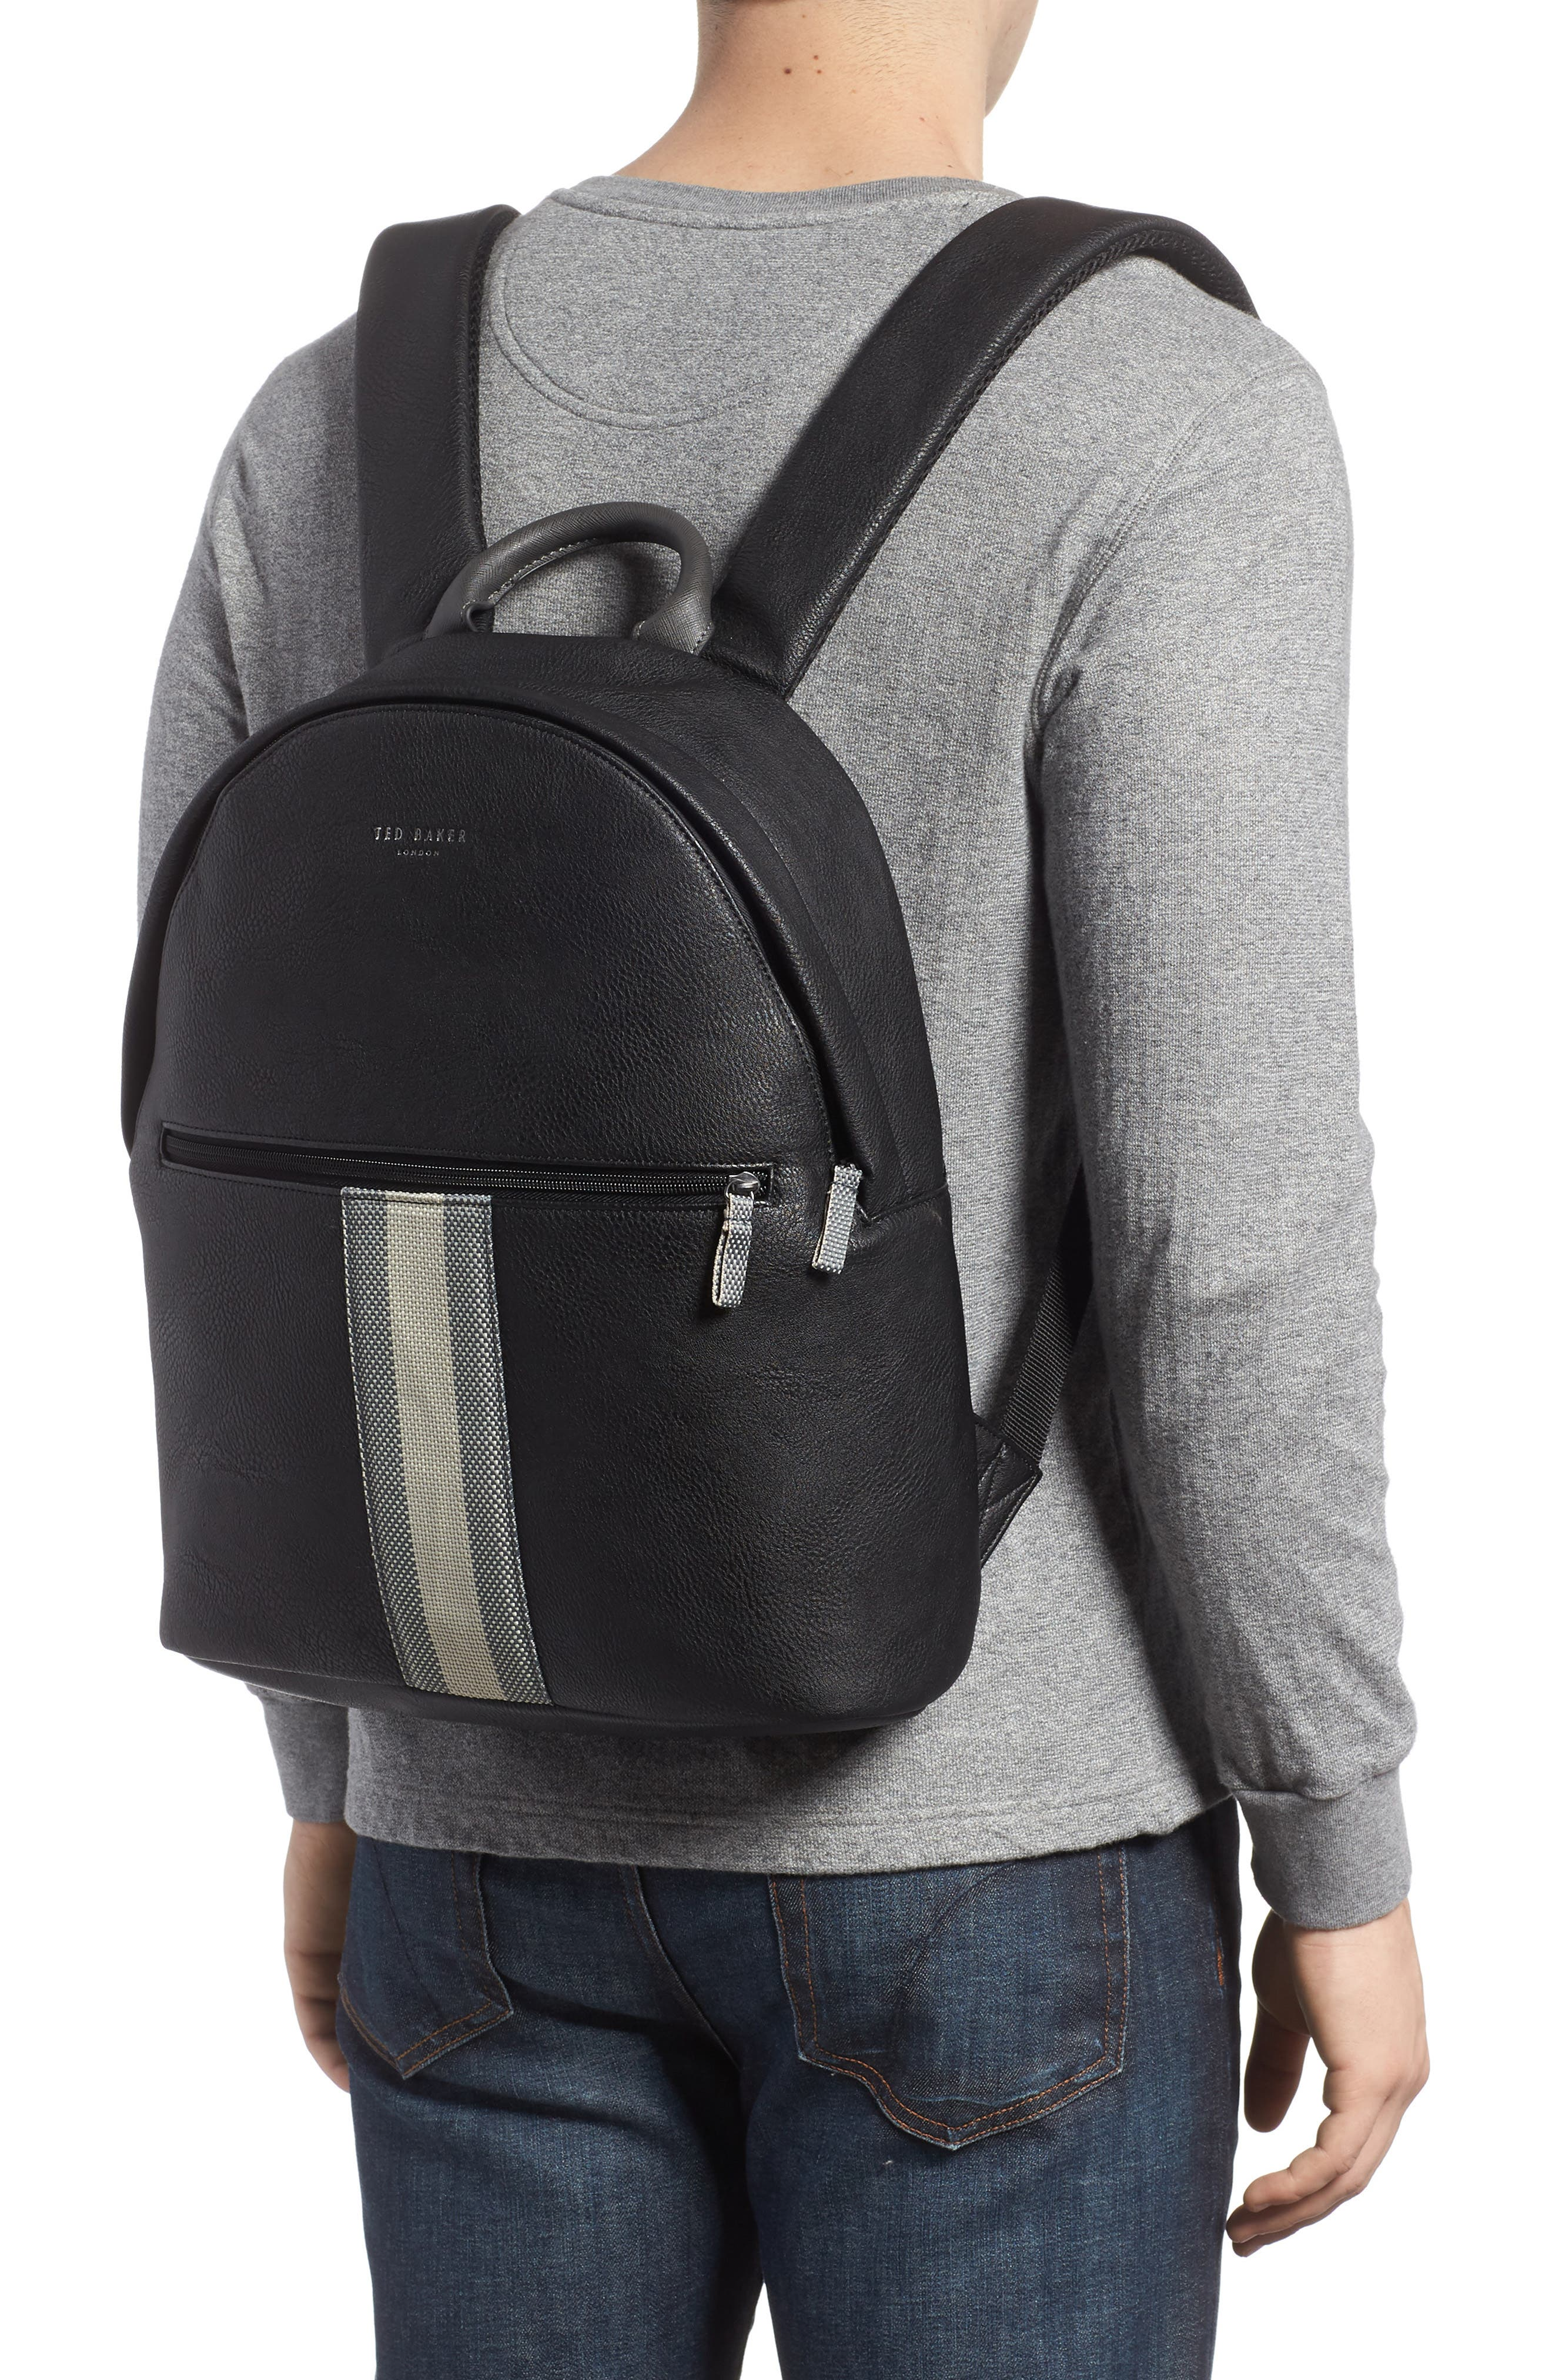 Royale Backpack,                             Alternate thumbnail 2, color,